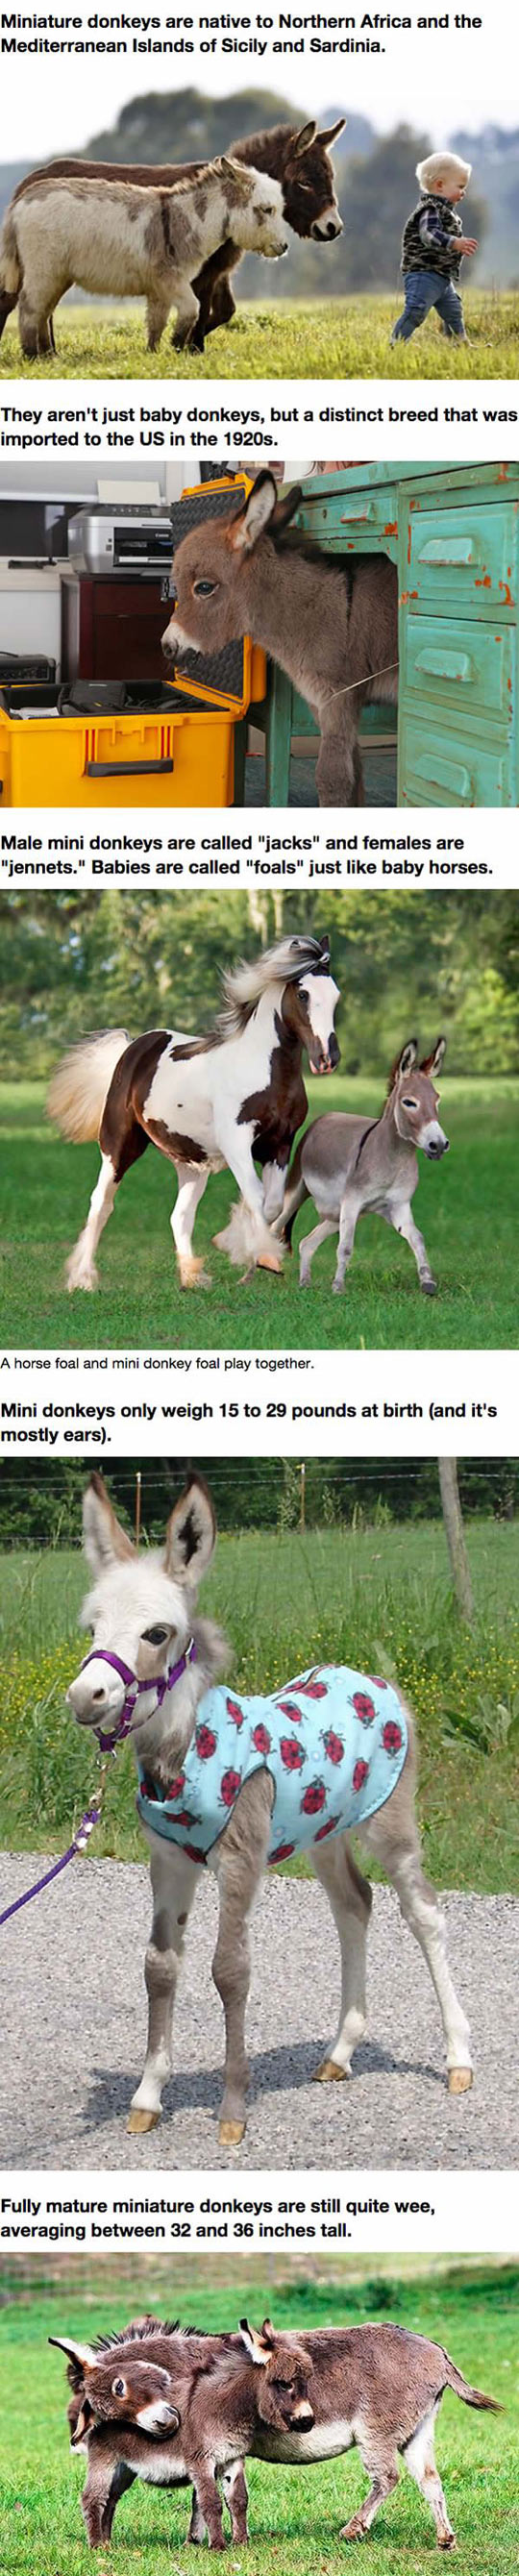 Mini Donkeys Maybe The Perfect Pet